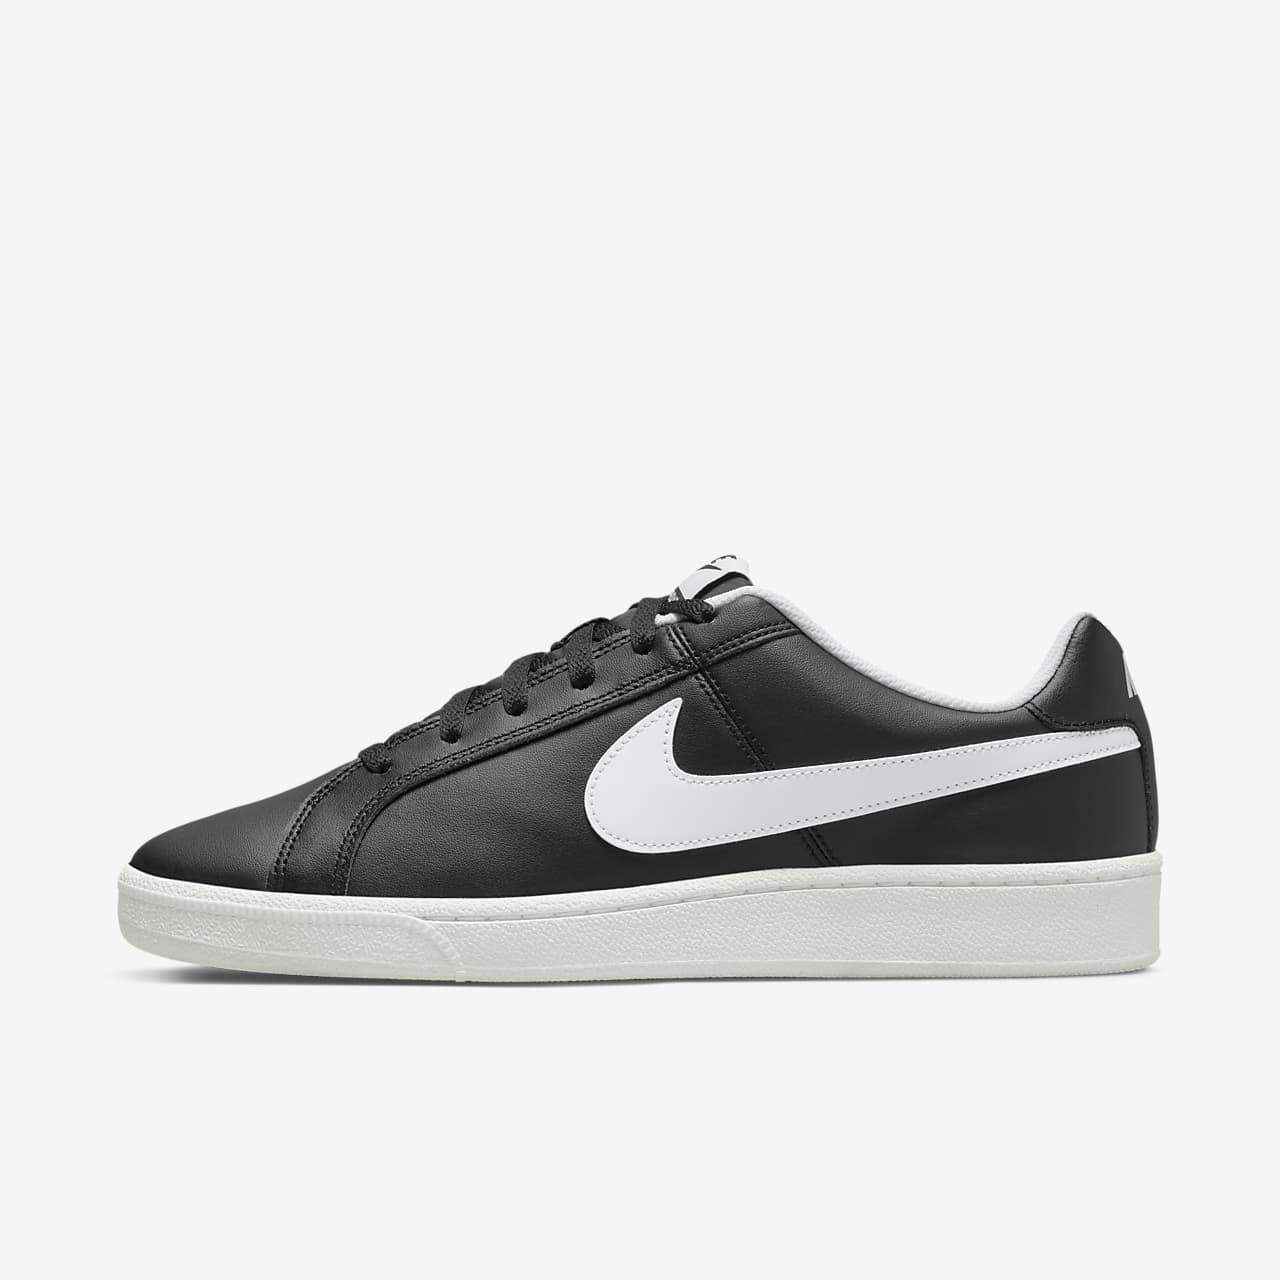 NikeCourt Royale Men's Shoe